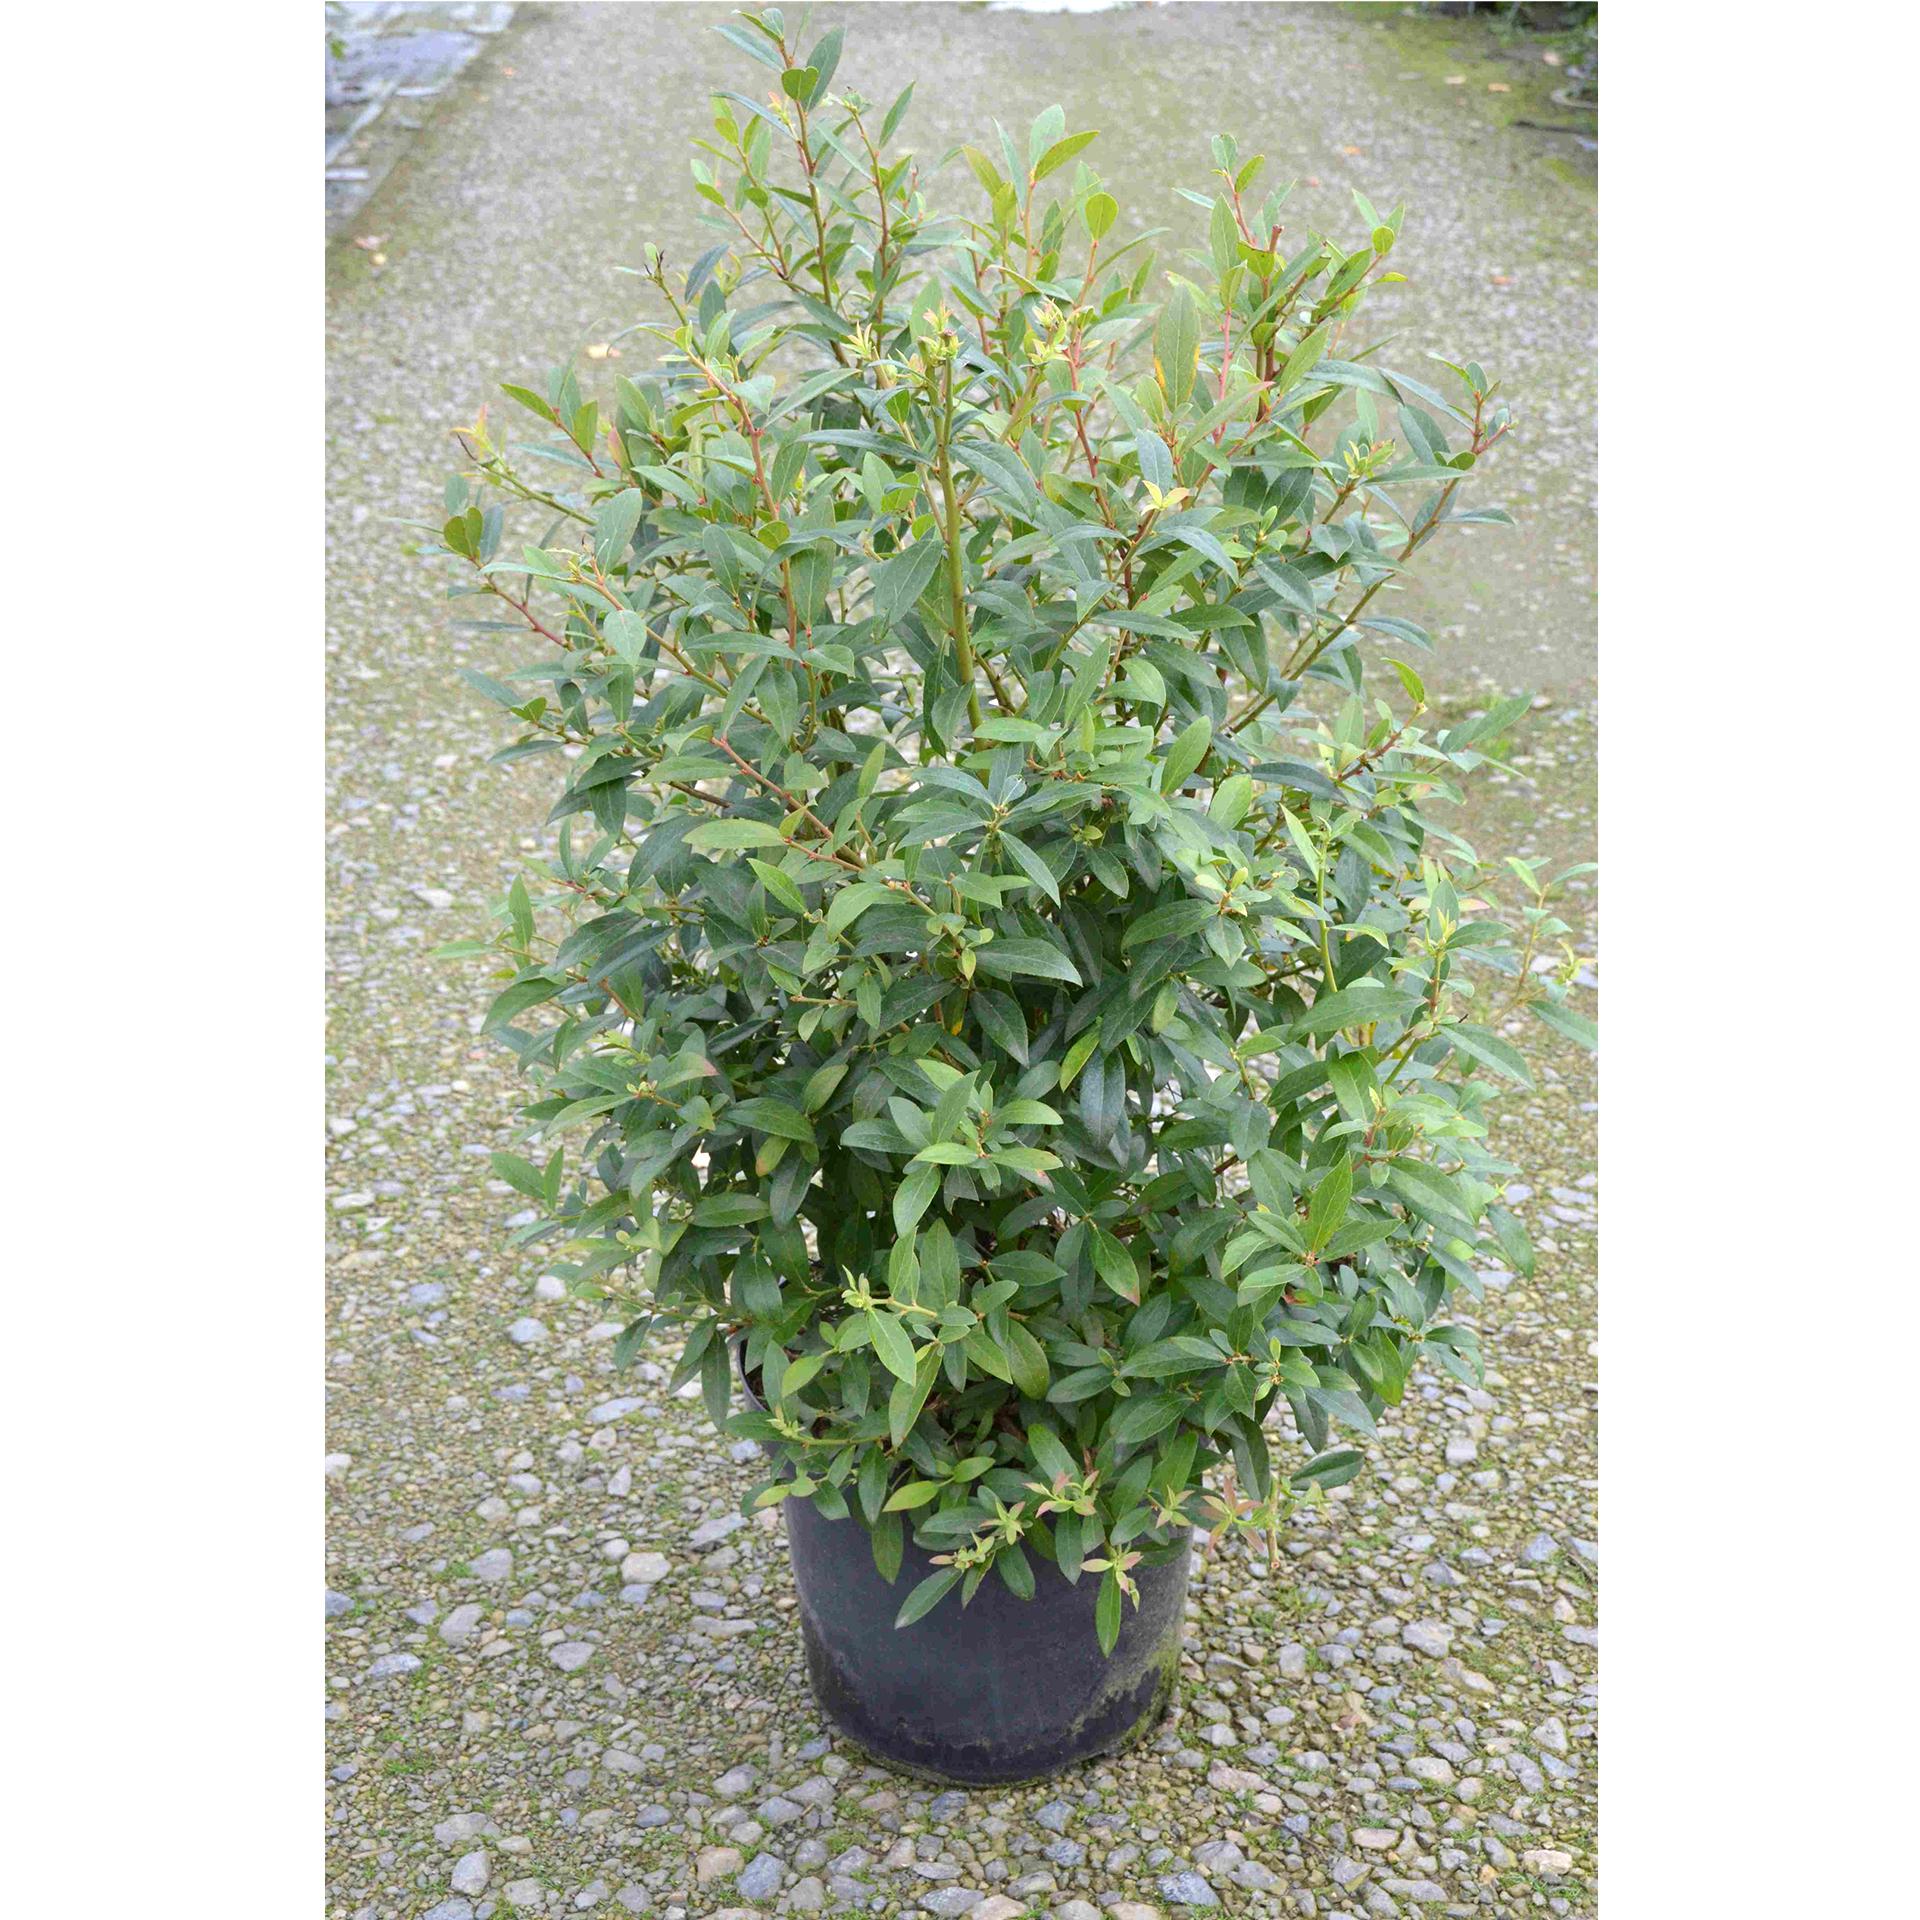 Heidelbeere - Vaccinium corymbosum 'Pink Blueberry', C10 80-100cm